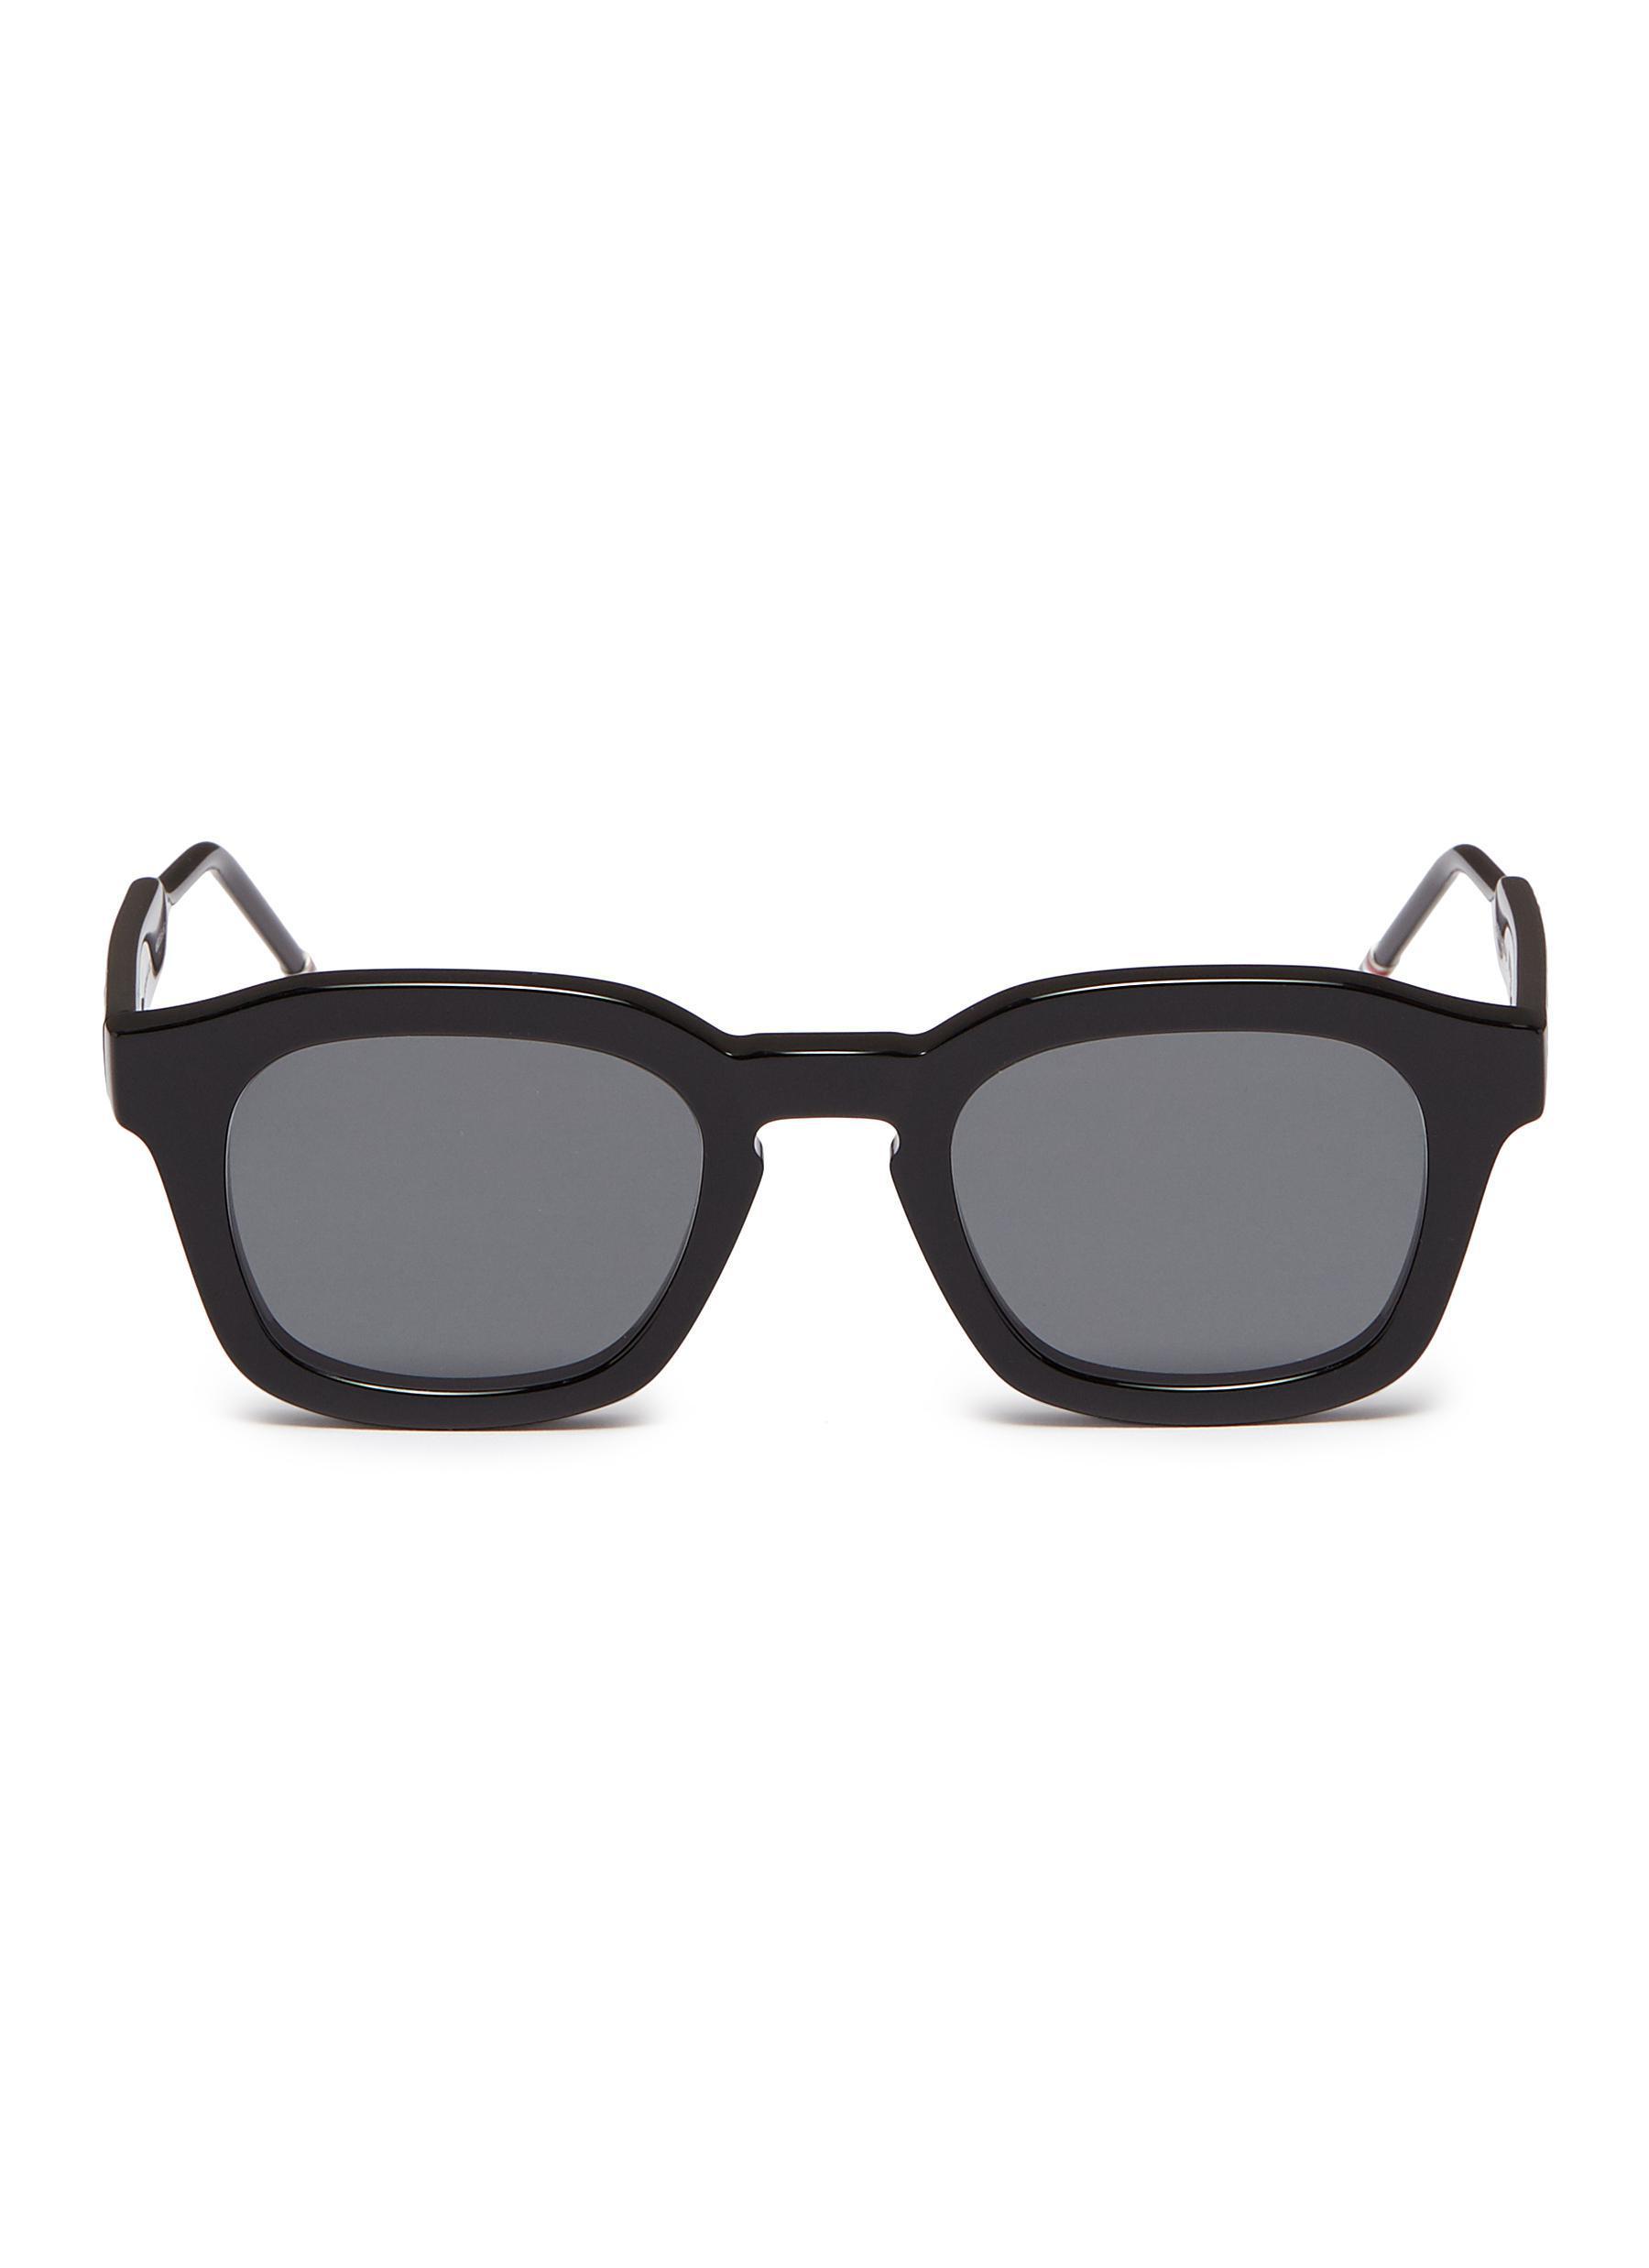 e184d28fee0d2 Lyst - Thom Browne Acetate Square Sunglasses in Black for Men